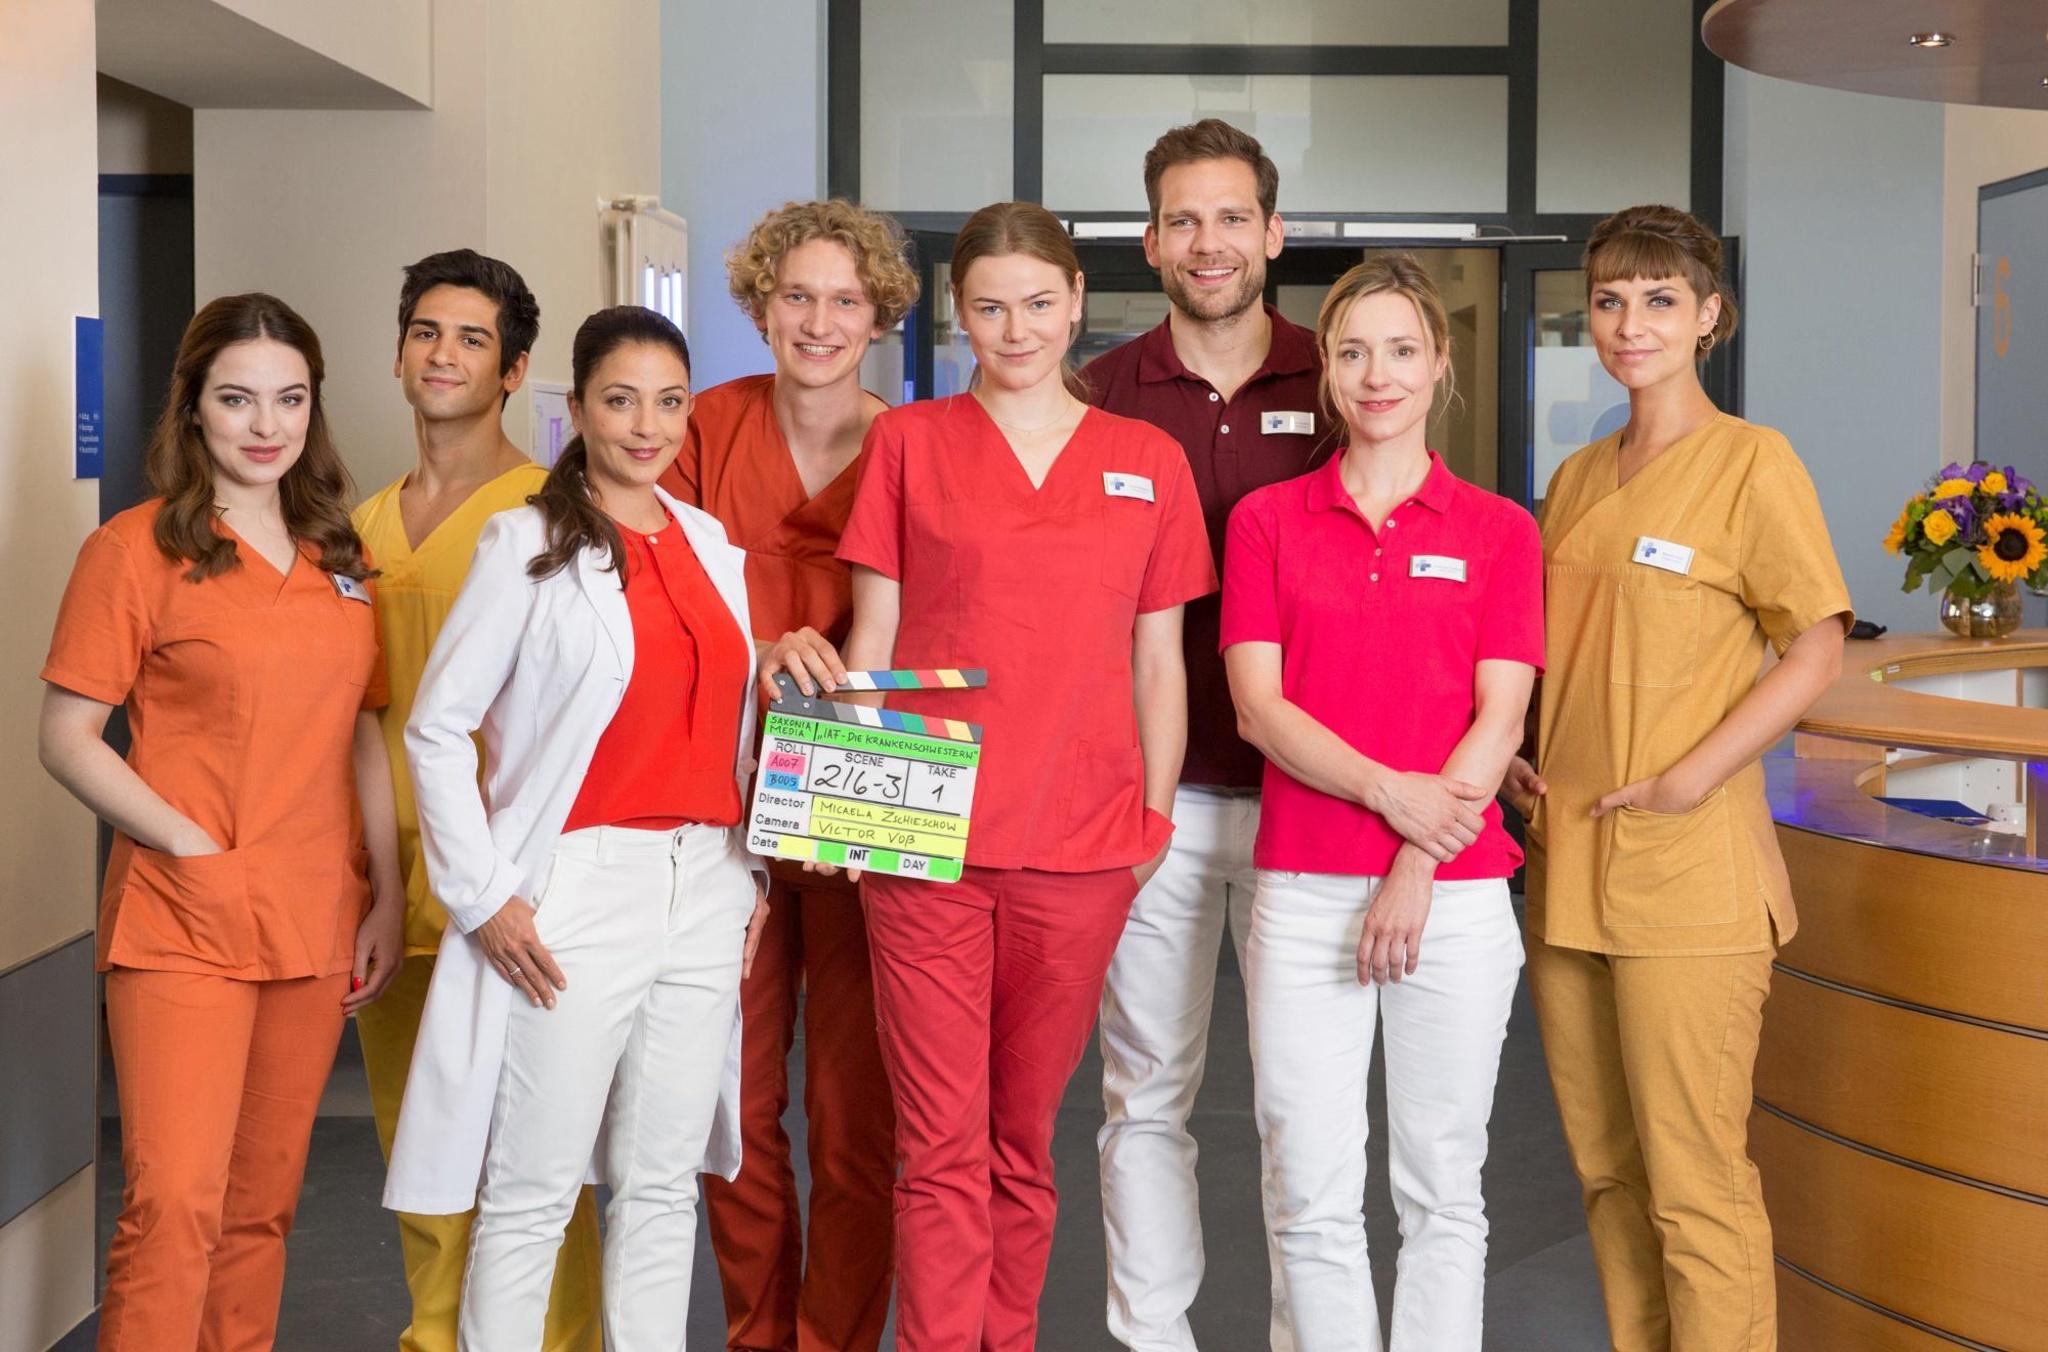 Die Krankenschwestern